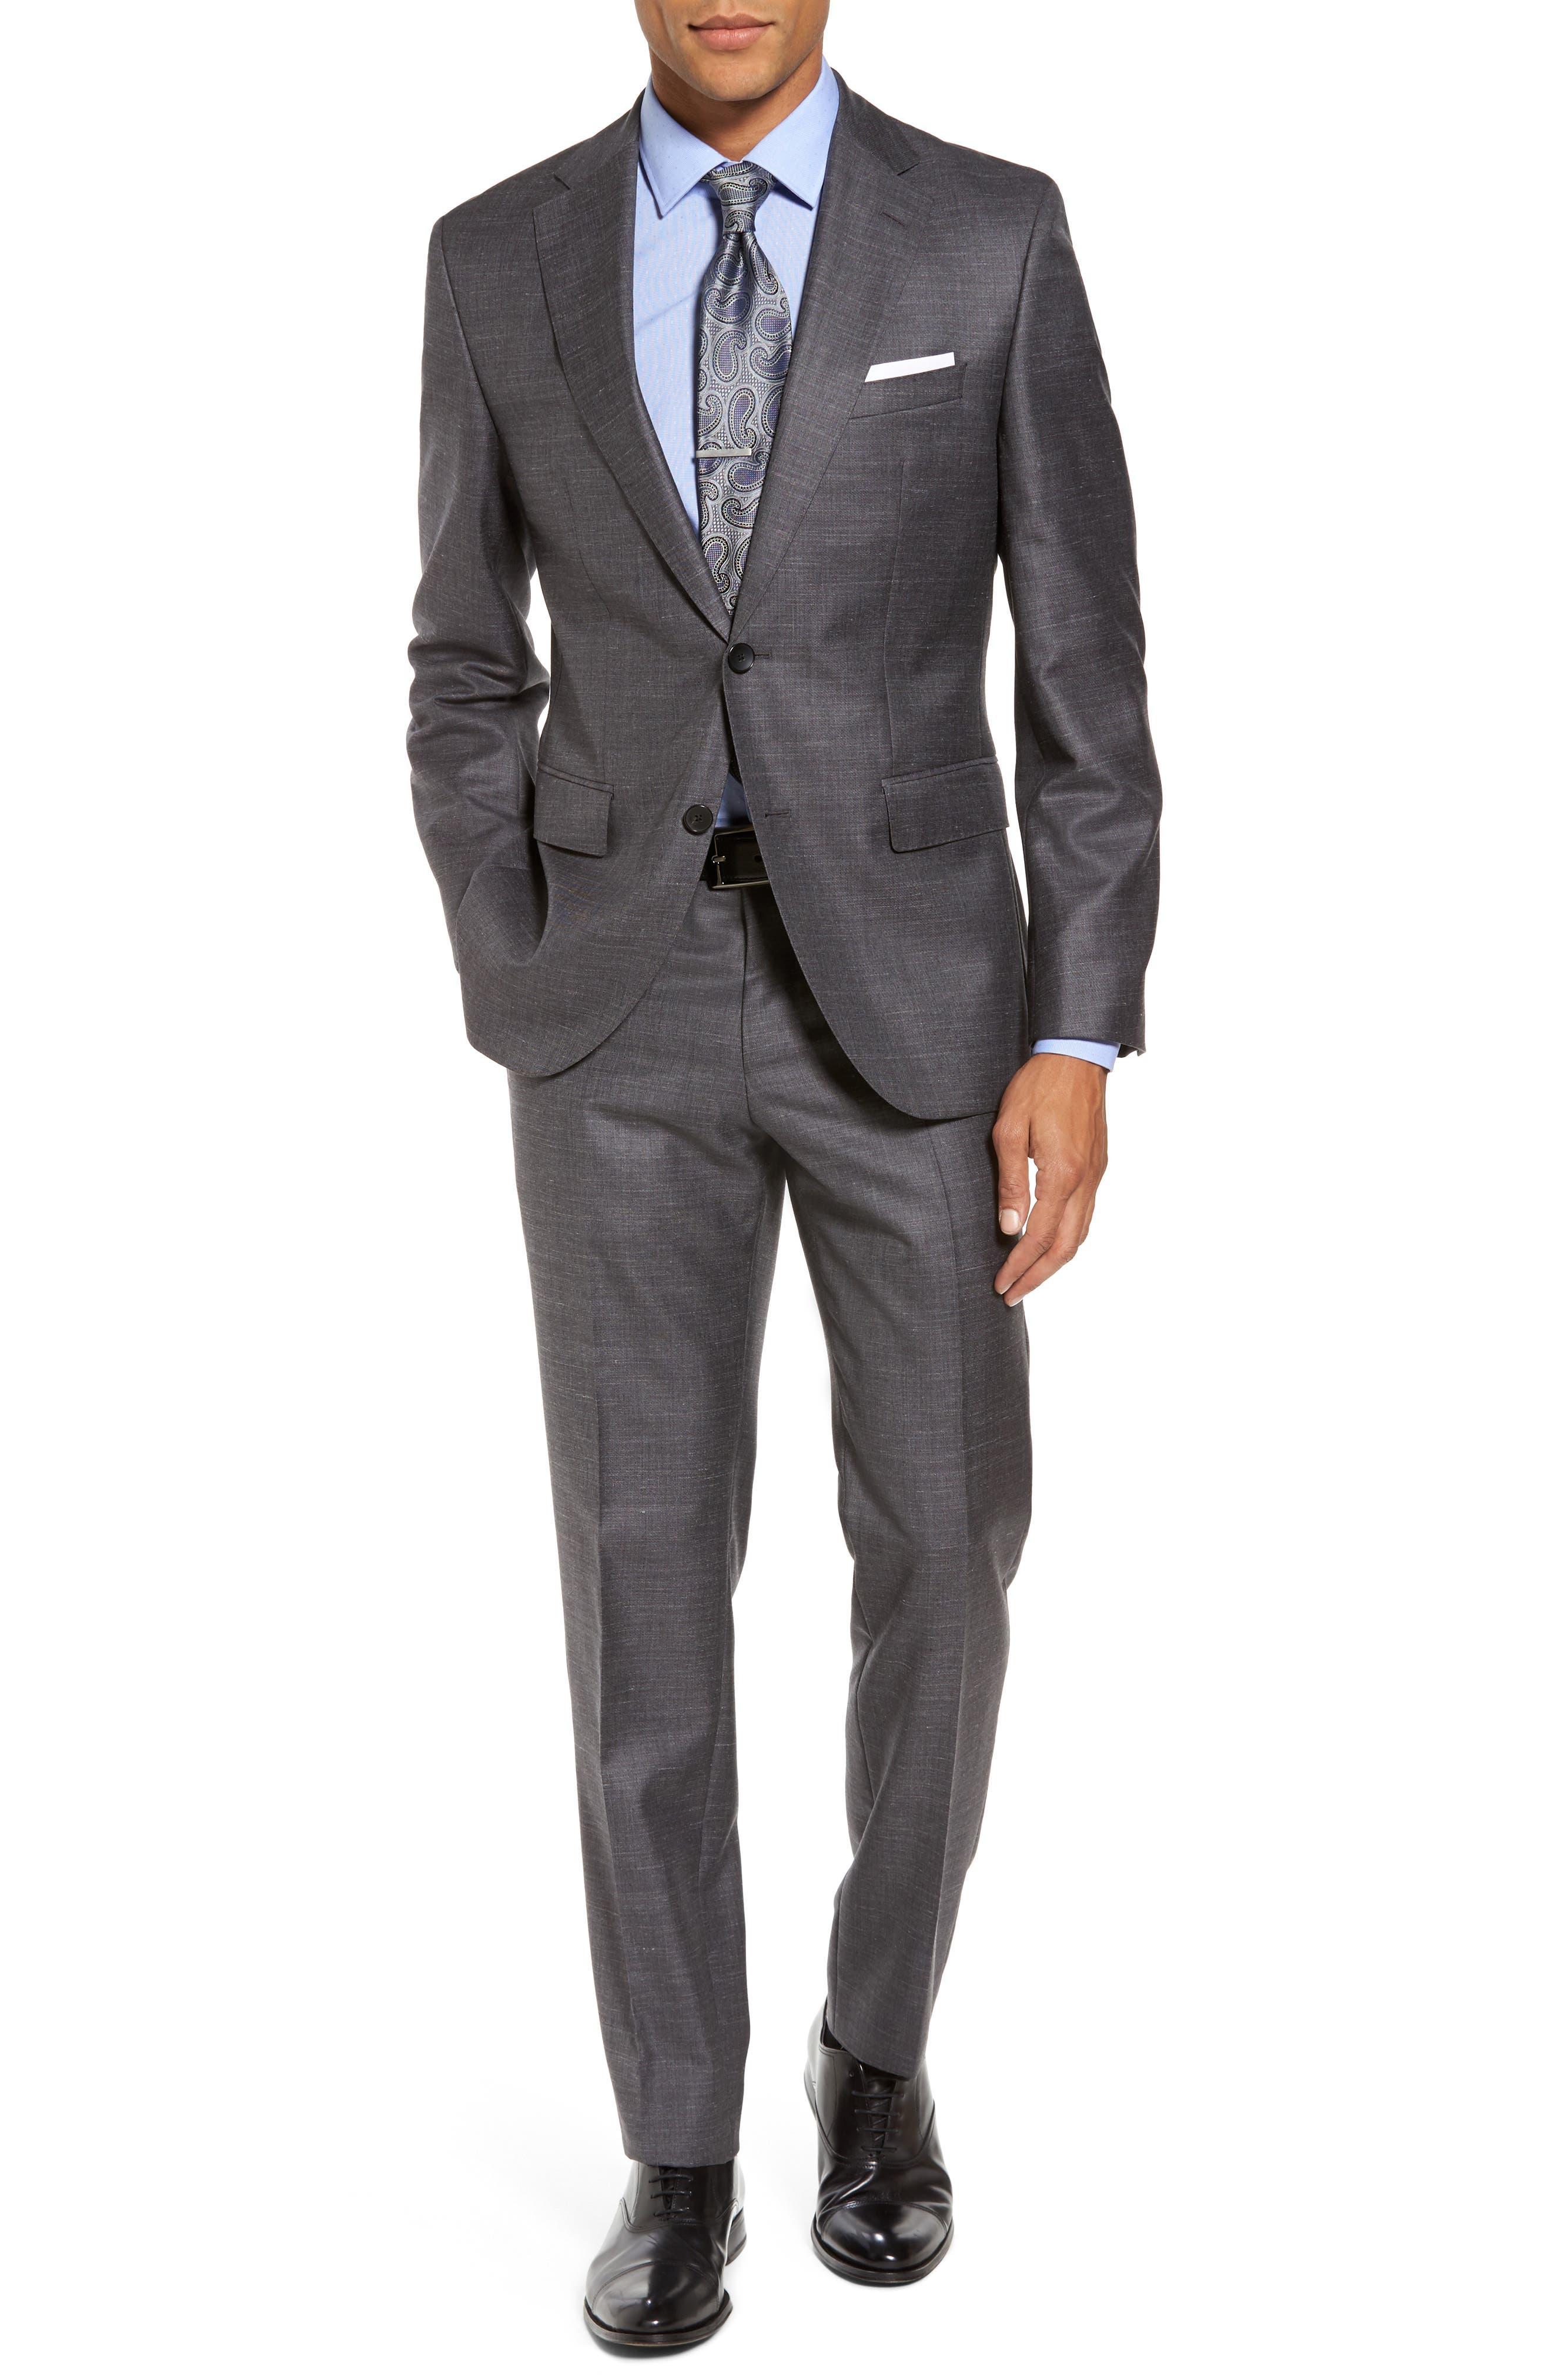 Main Image - BOSS Johnstons/Lenon Trim Fit Solid Wool Blend Suit